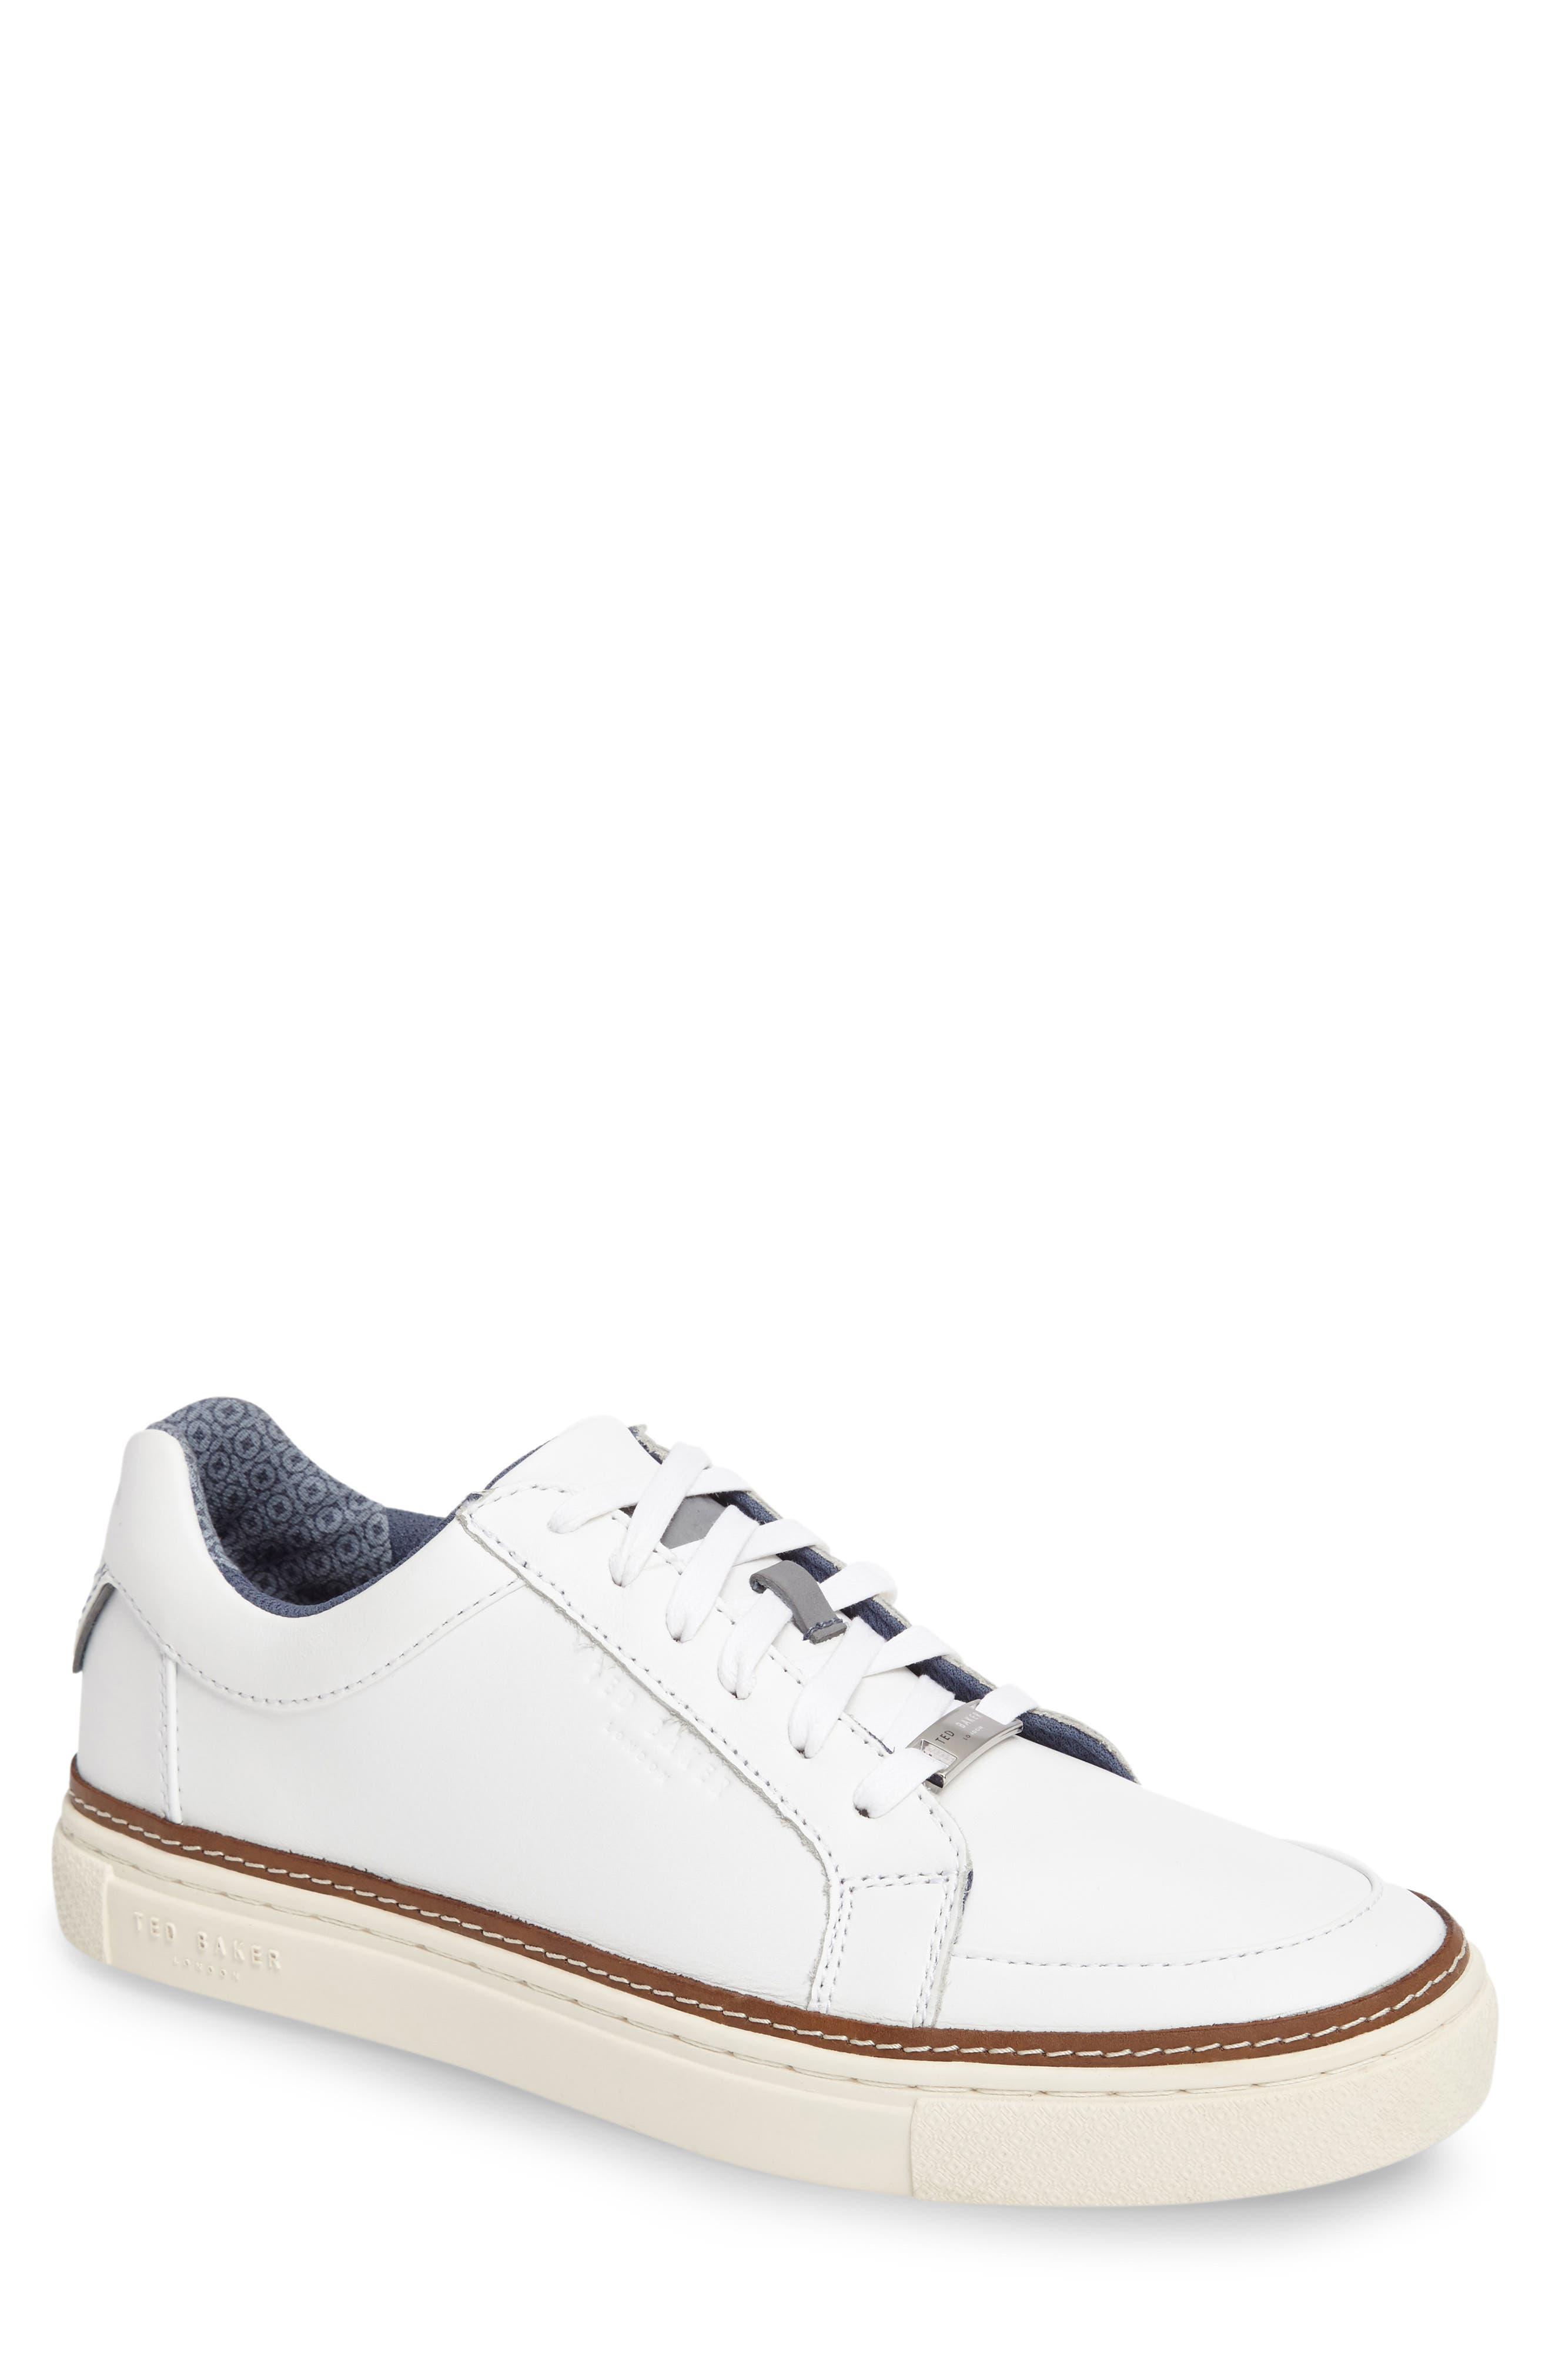 Alternate Image 1 Selected - Ted Baker London Rouu Sneaker (Men)